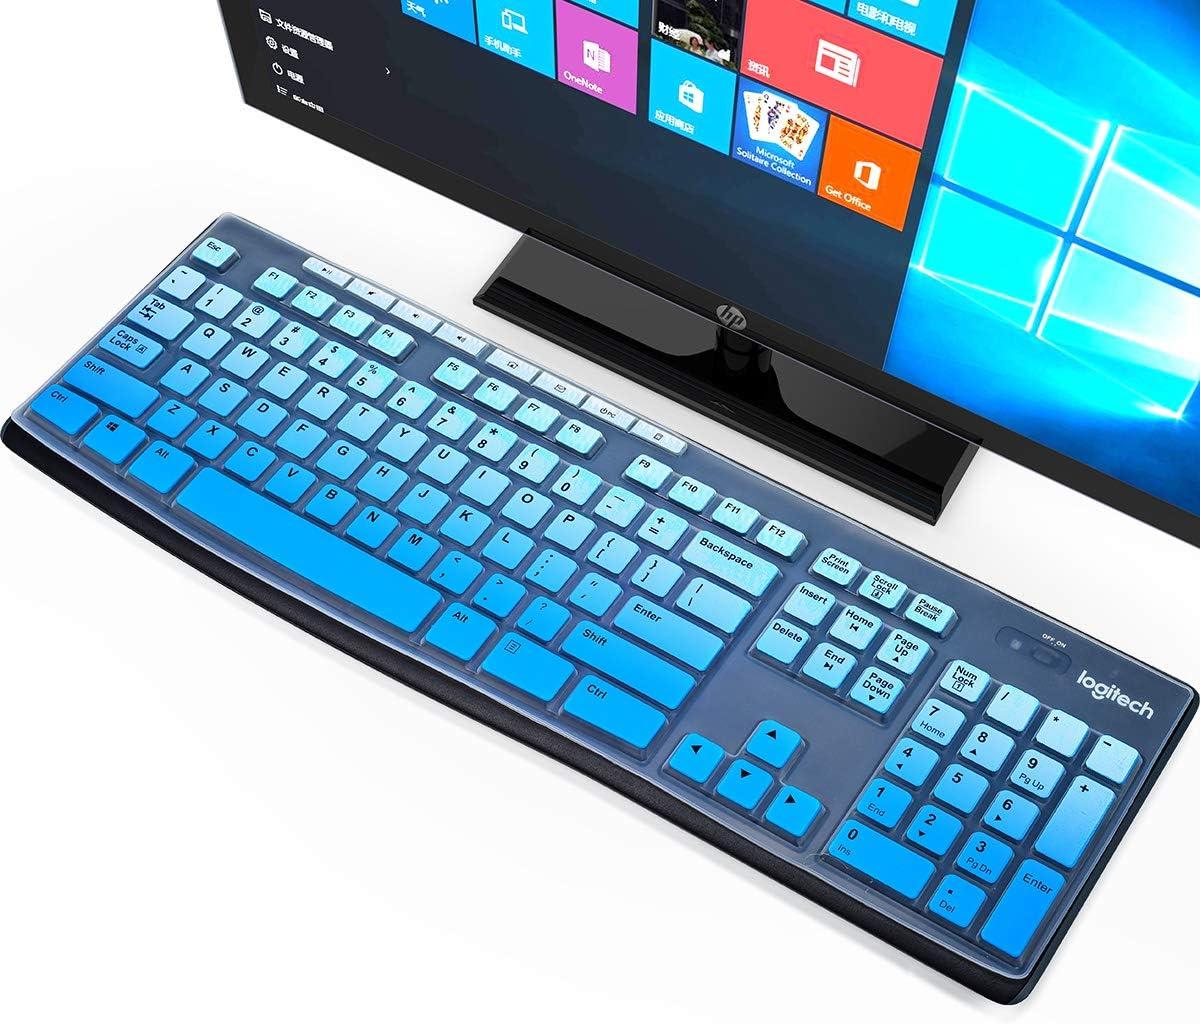 Keyboard Skin Cover for Logitech MK270 MK275 MK260 MK200 K270 K260 K200 Ultra Thin Soft Keyboard Skin Protector, Logitech Keyboard Accessories, Ombre Blue (US Layout)